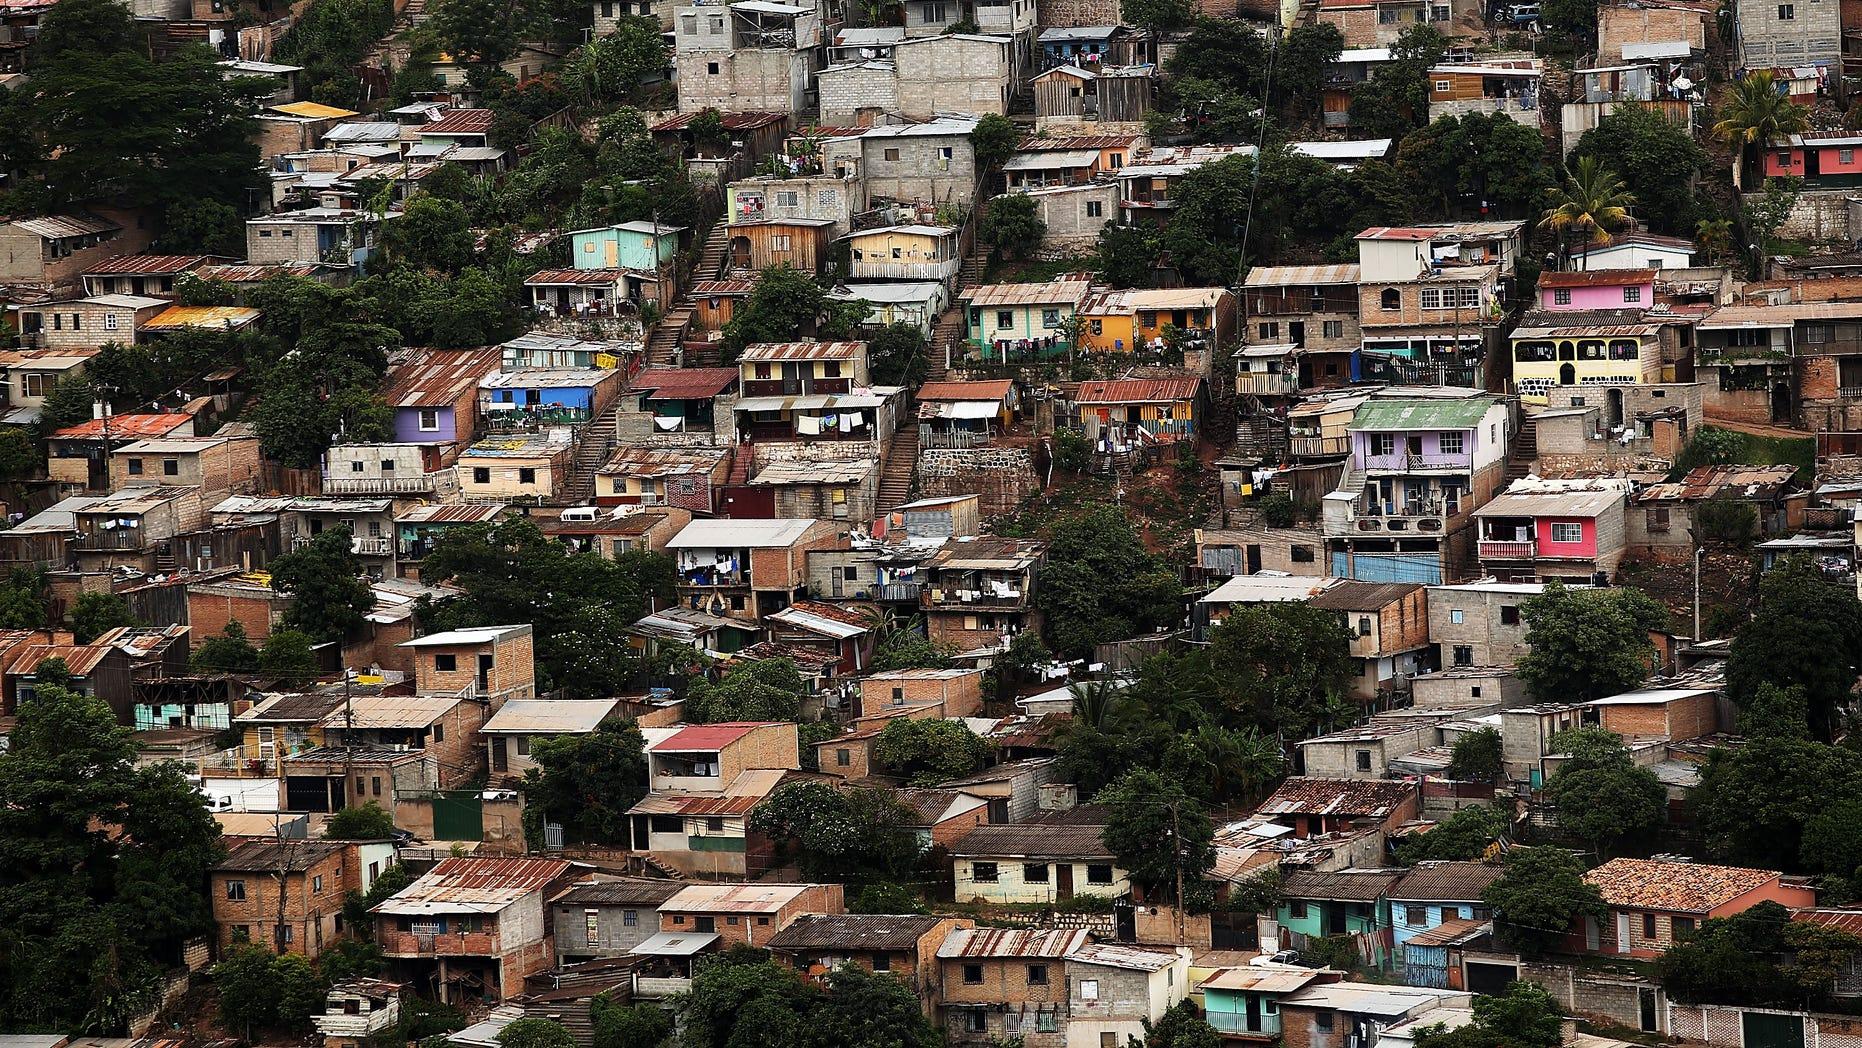 Slums are viewed in the capital city of Tegucigalpa, Honduras.